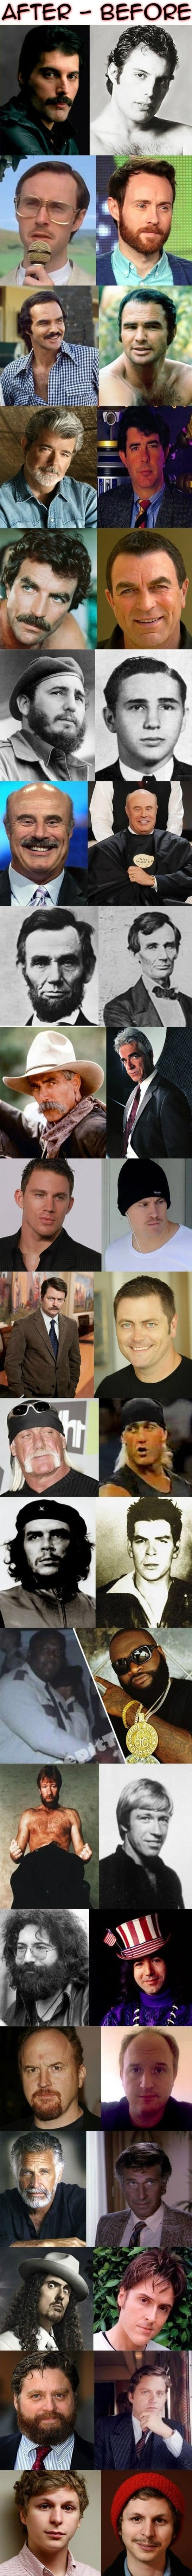 funny-celebirty-beards-after-vs-before-meme-jokes